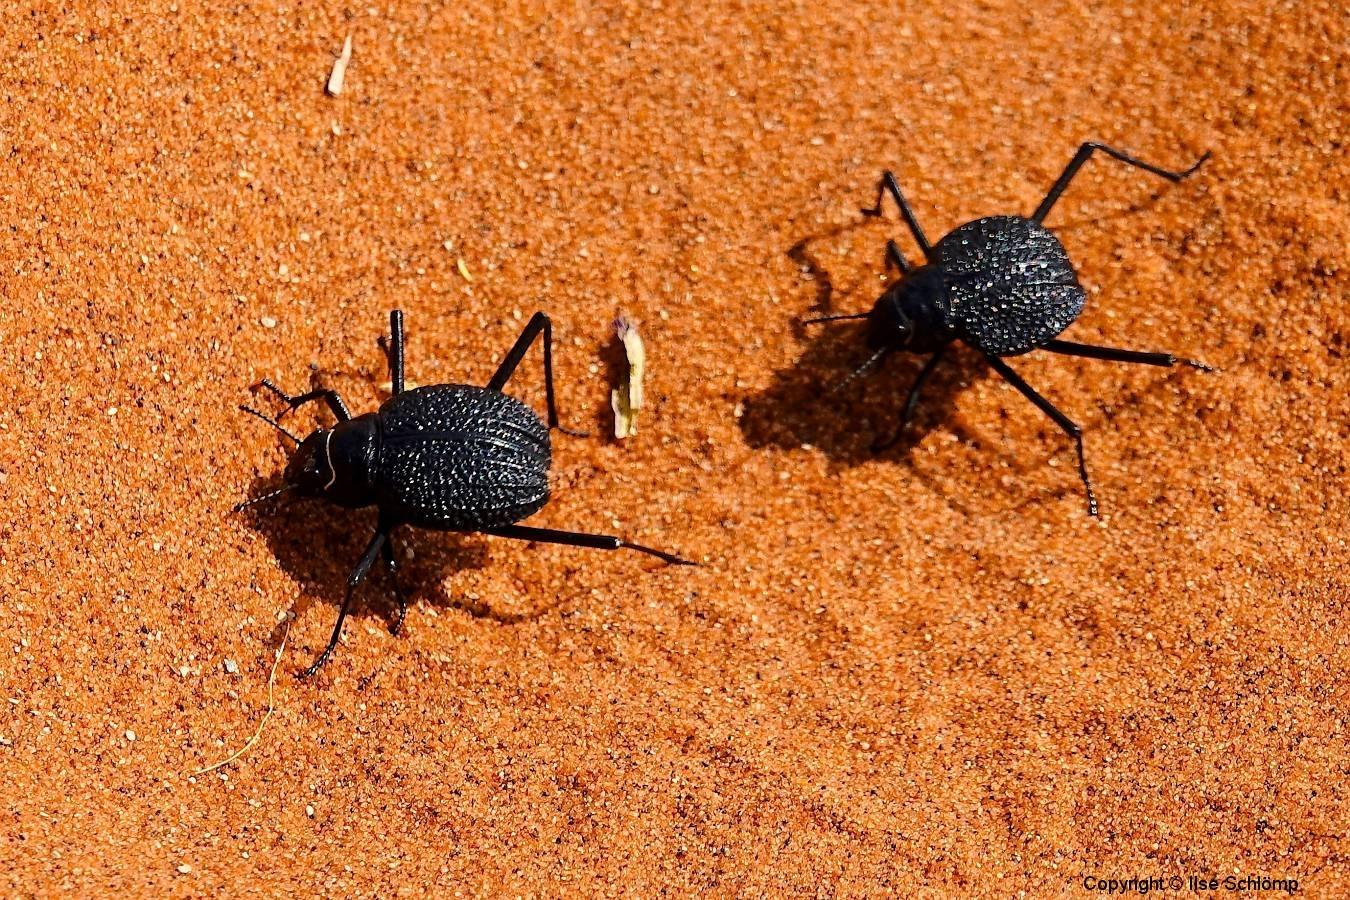 Namibia, Sossusvlei, Schwarzkäfer